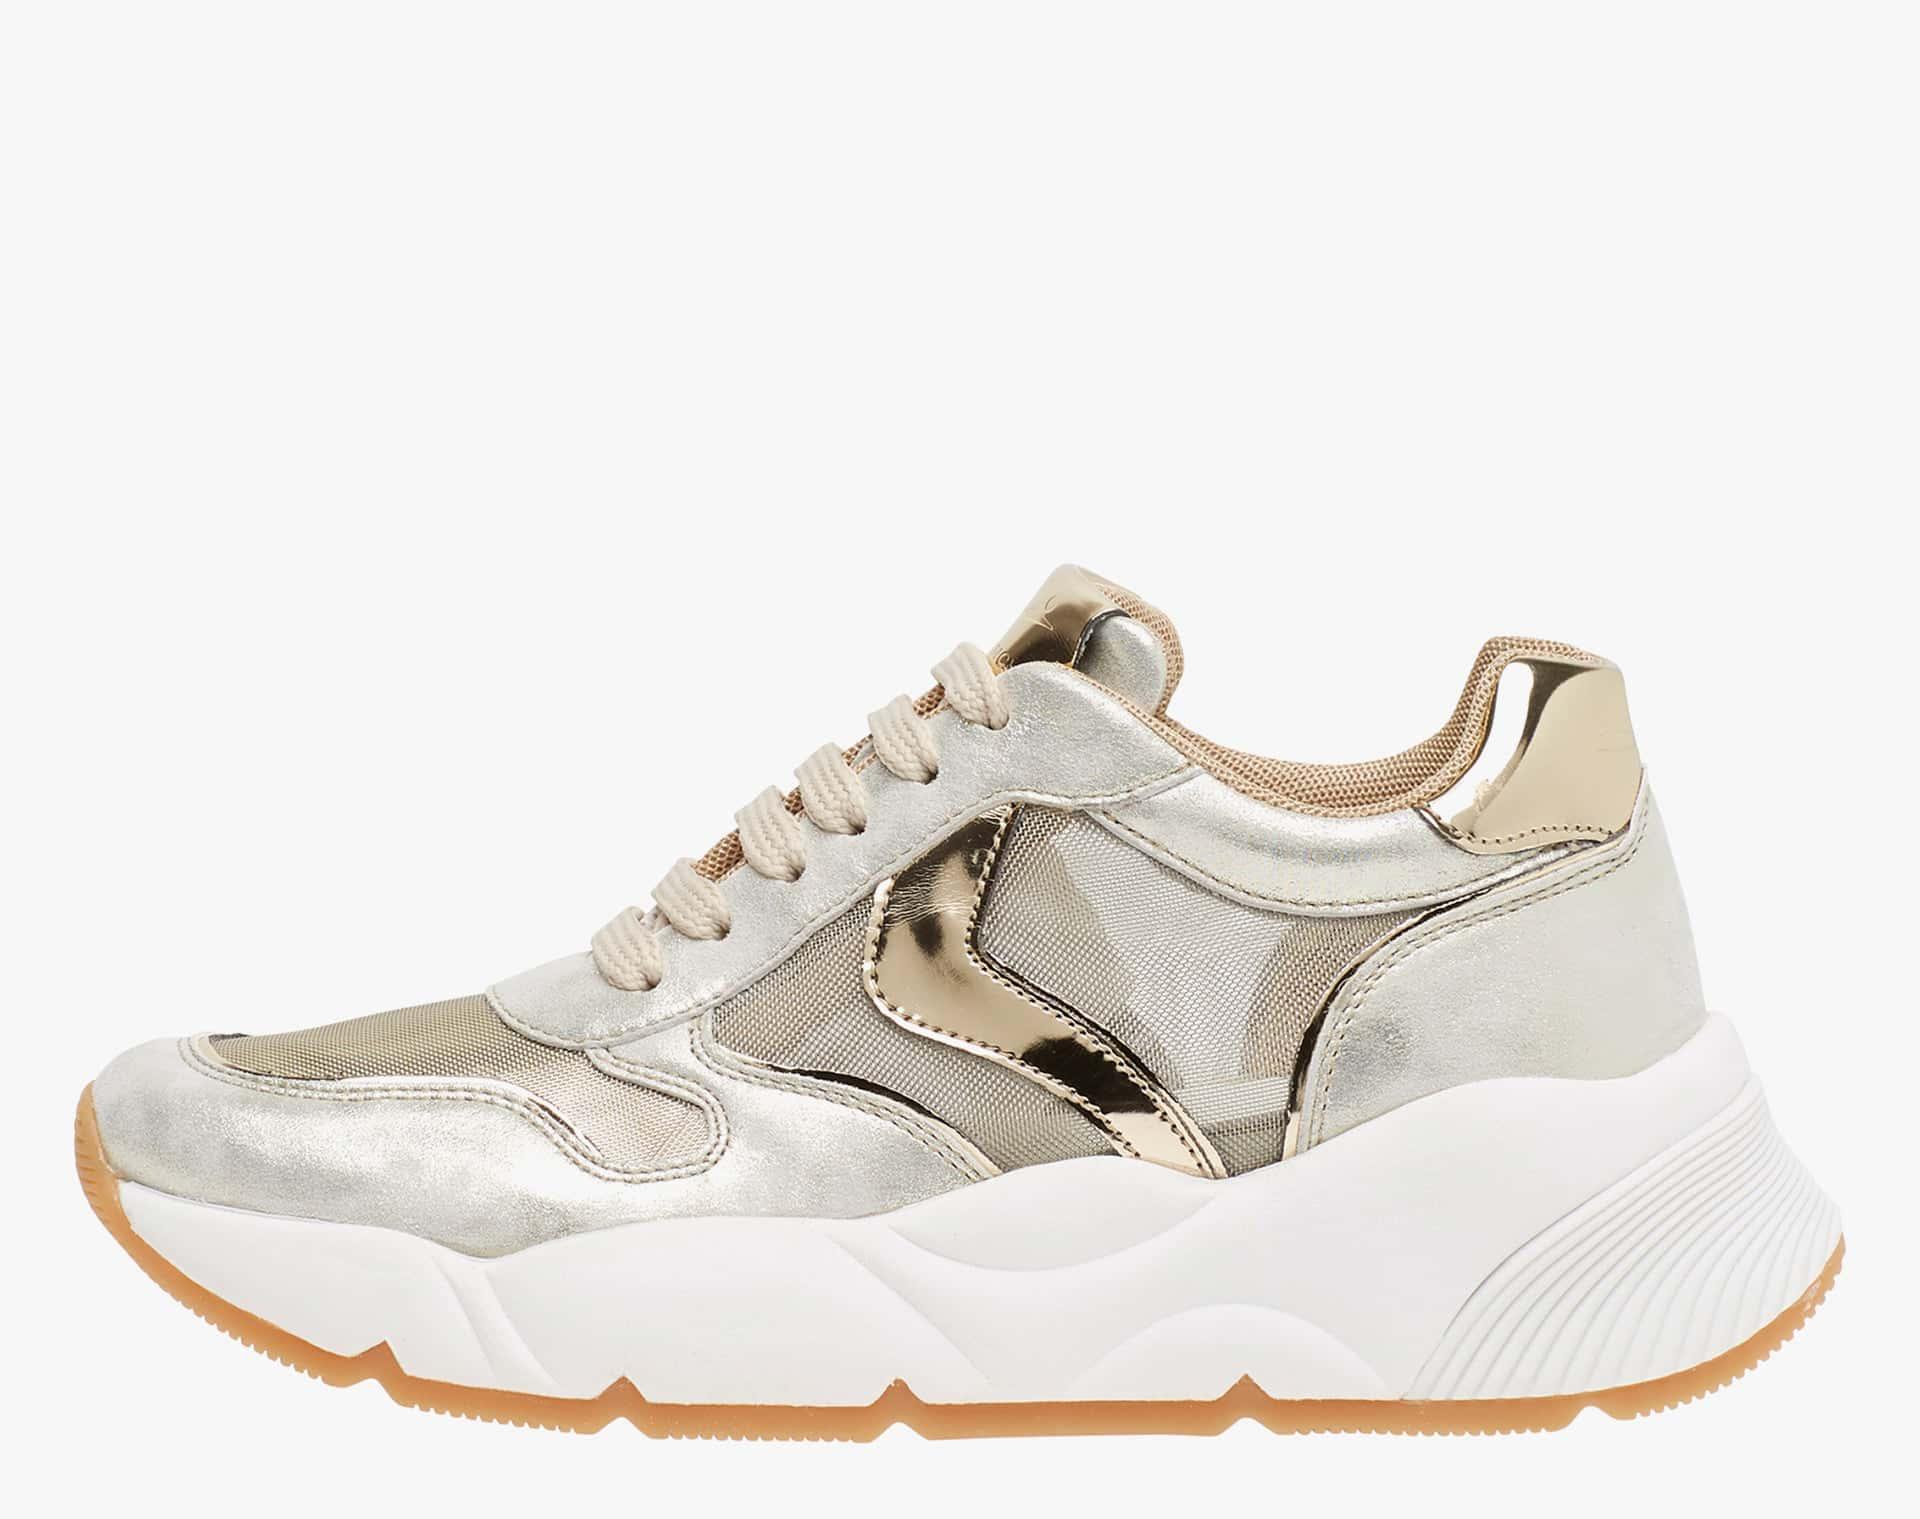 SHEEL MESH - Sneaker in pelle laminata - Platino